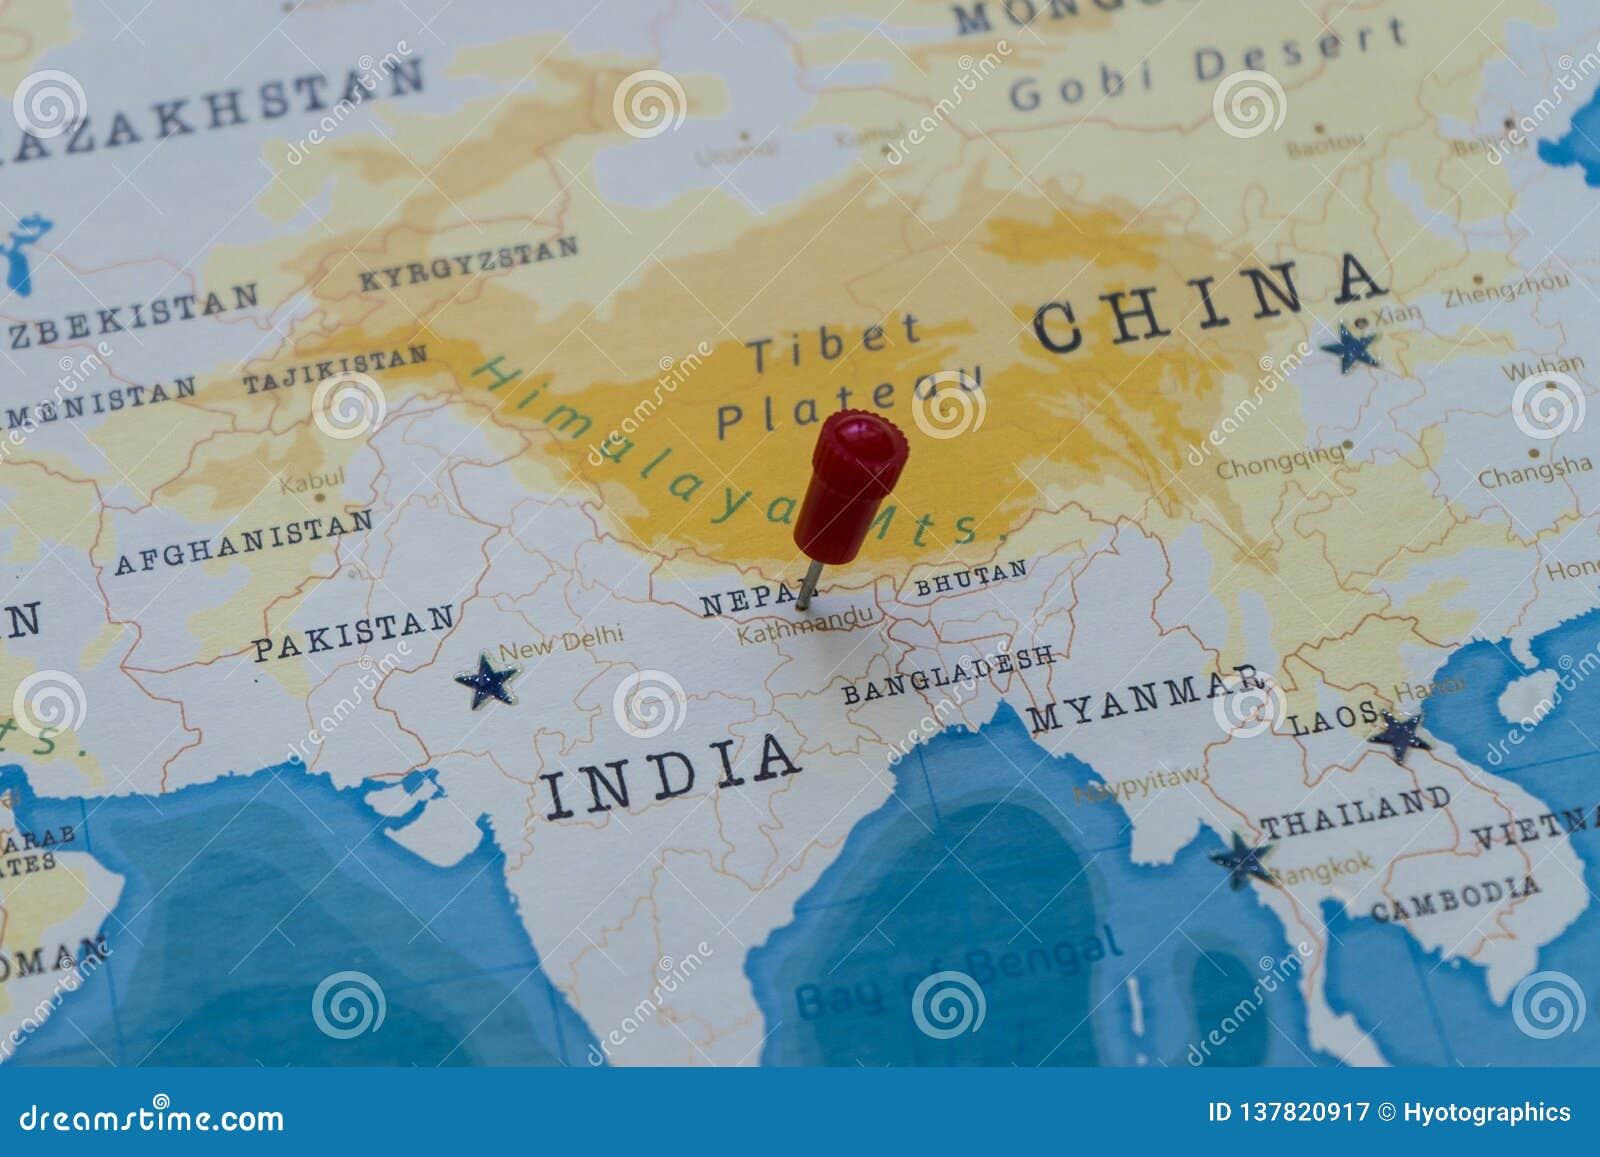 A Pin On Kathmandu, Nepal In The World Map Stock Image ...